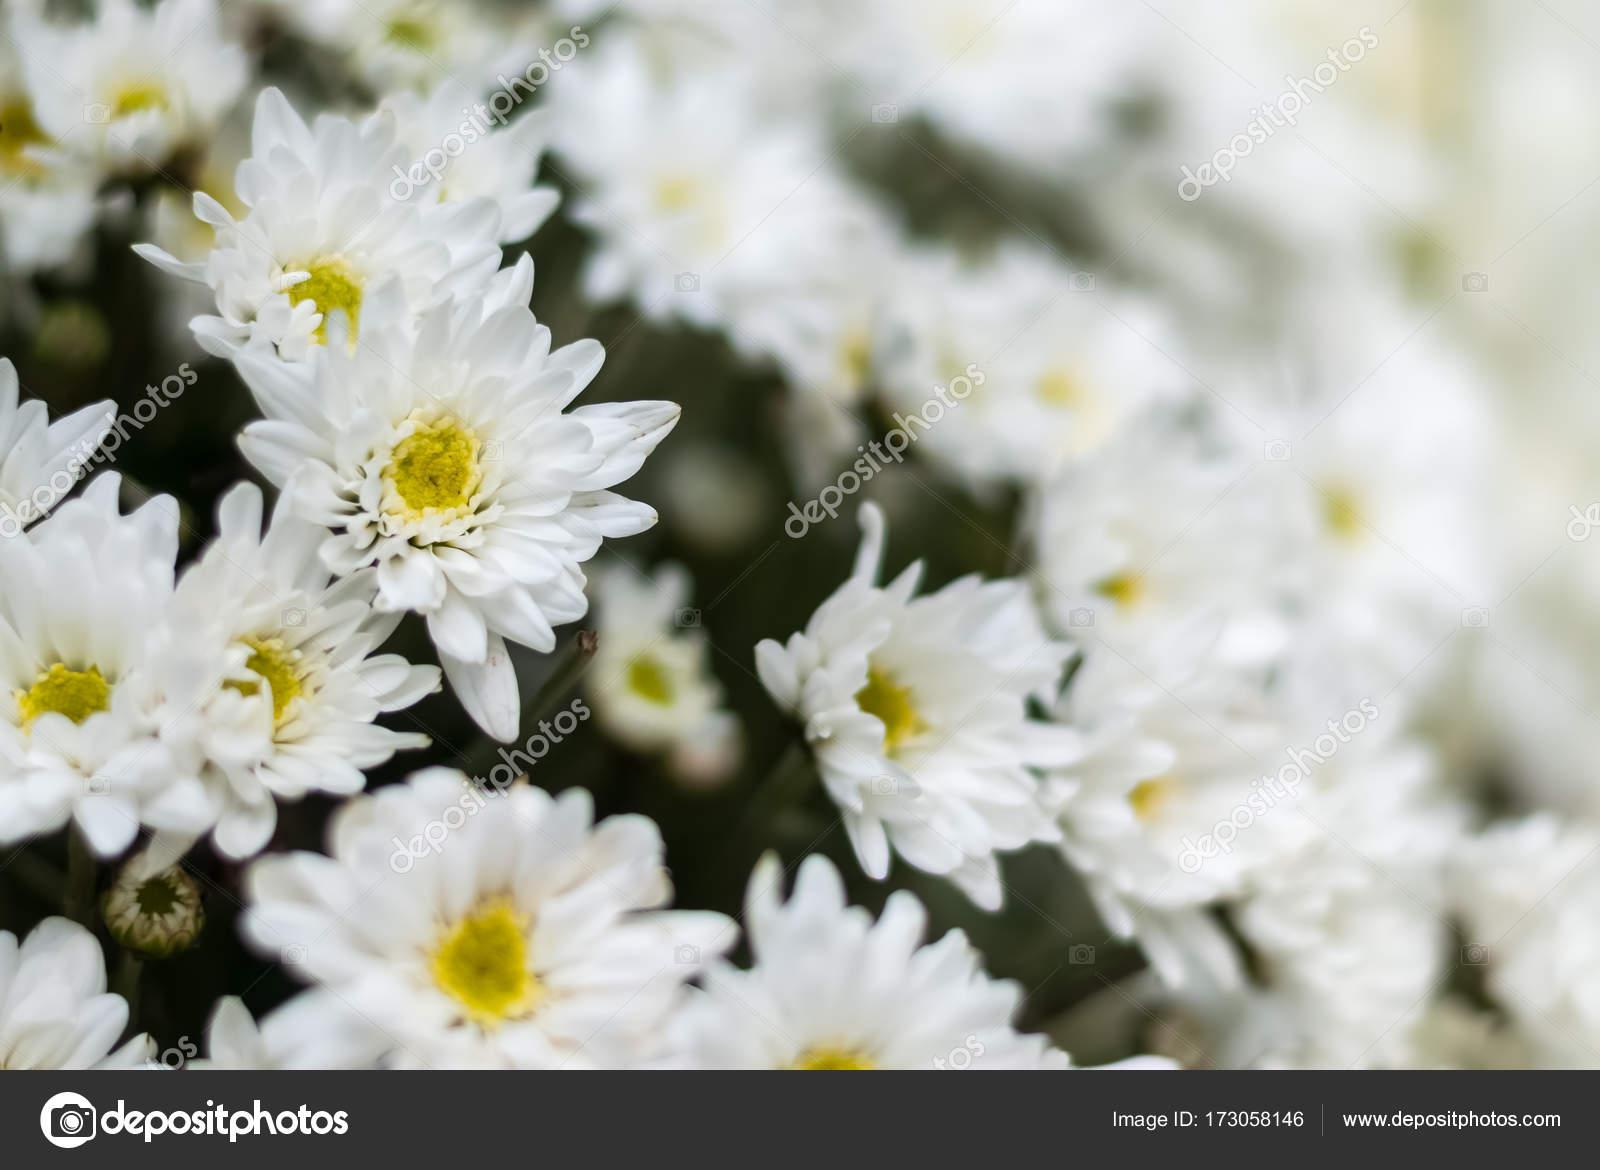 Closeup white chrysanthemum flower bouquet stock photo closeup white chrysanthemum flower bouquet stock photo mightylinksfo